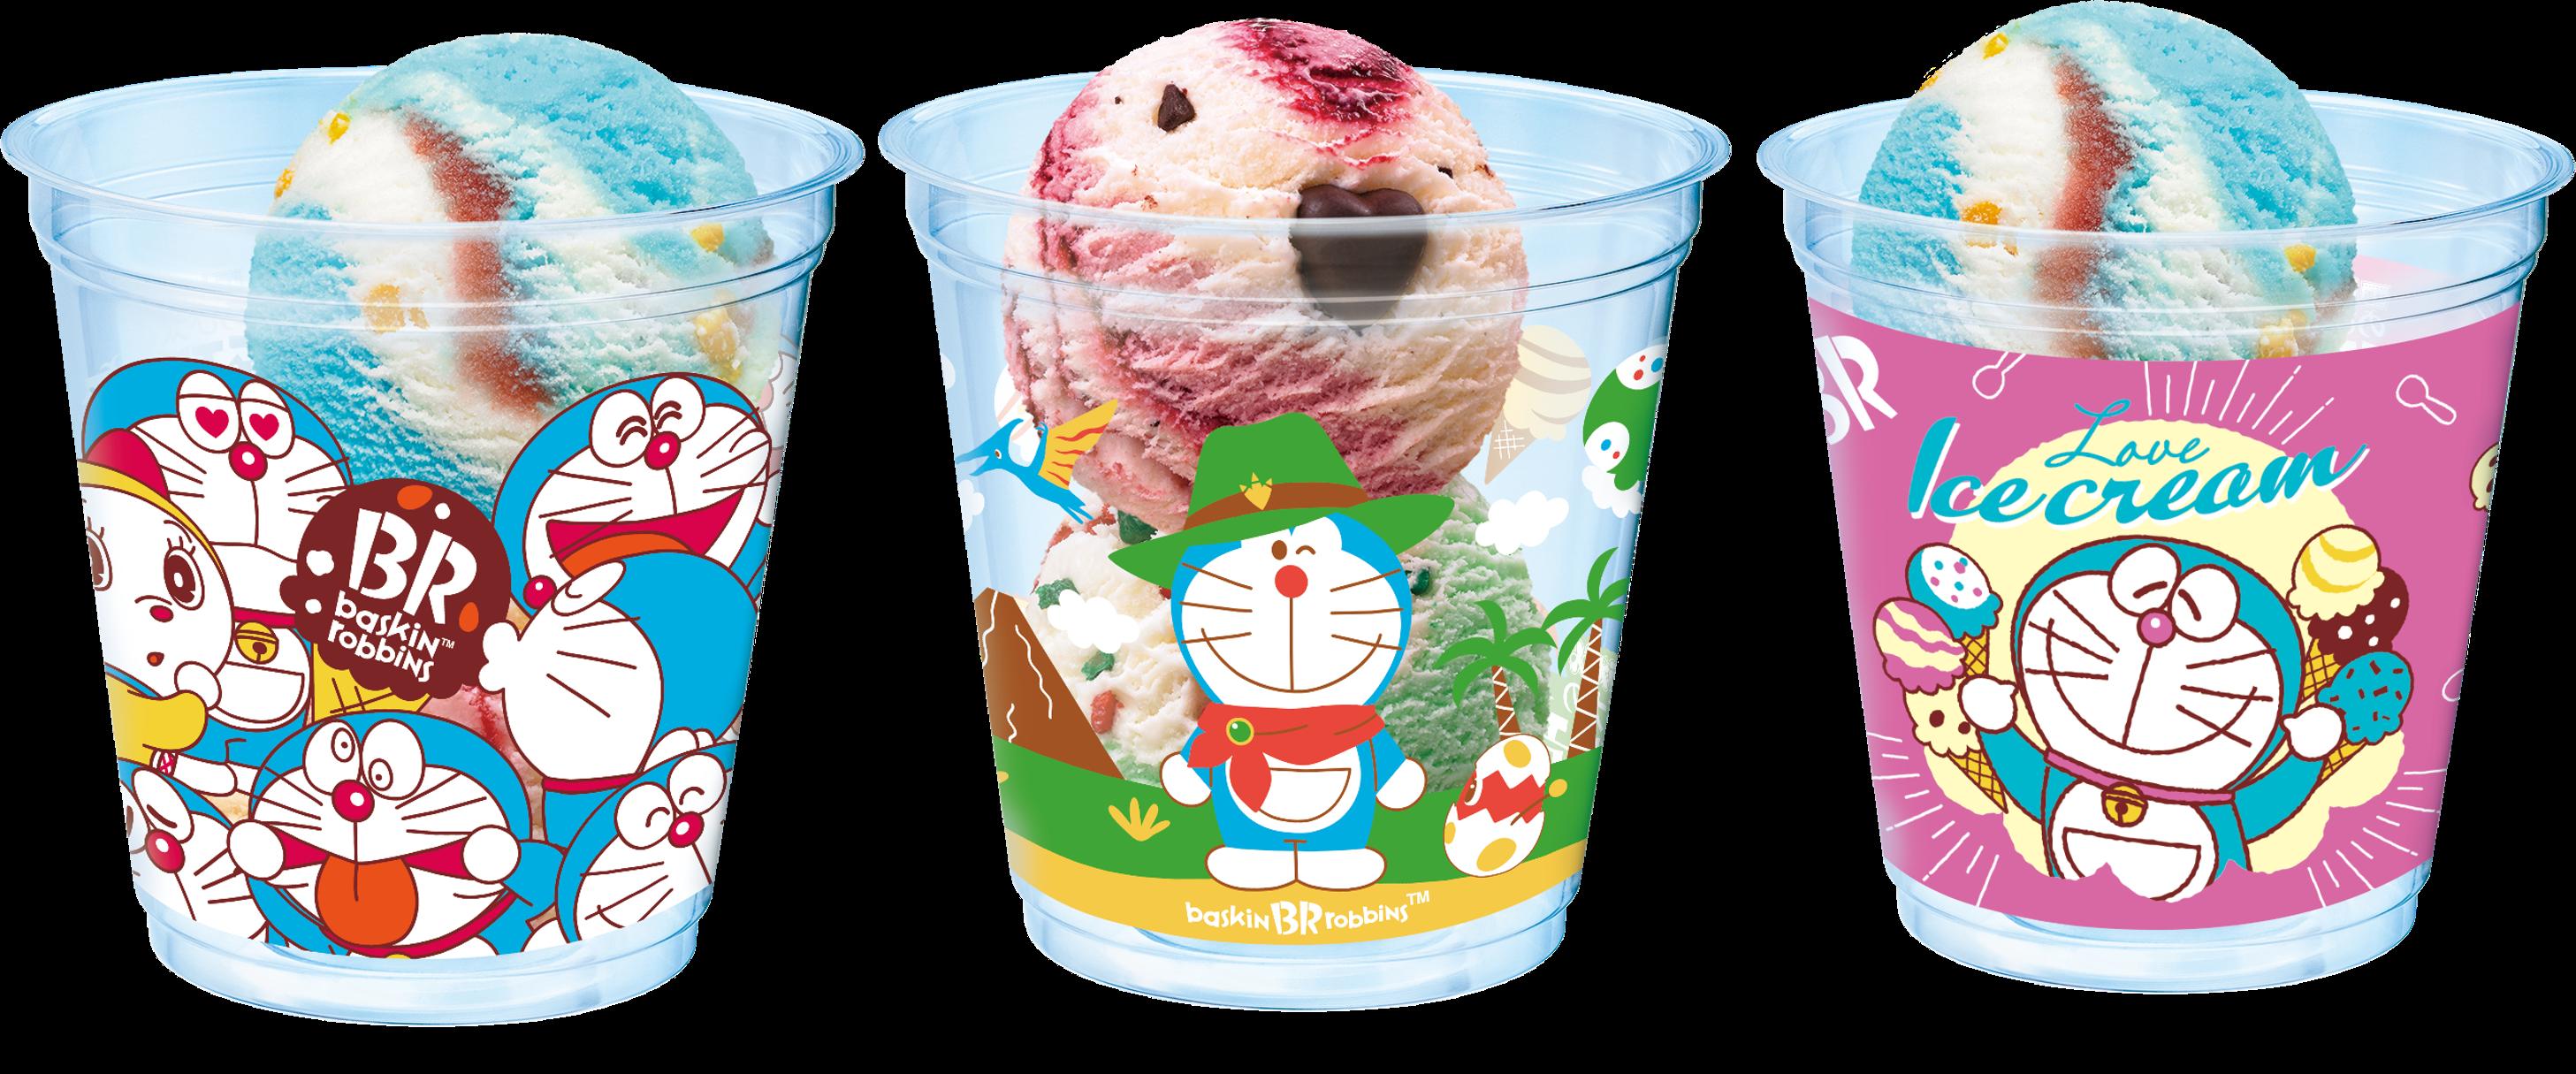 Baskin Robbins Doraemon-themed ice cream and dessert